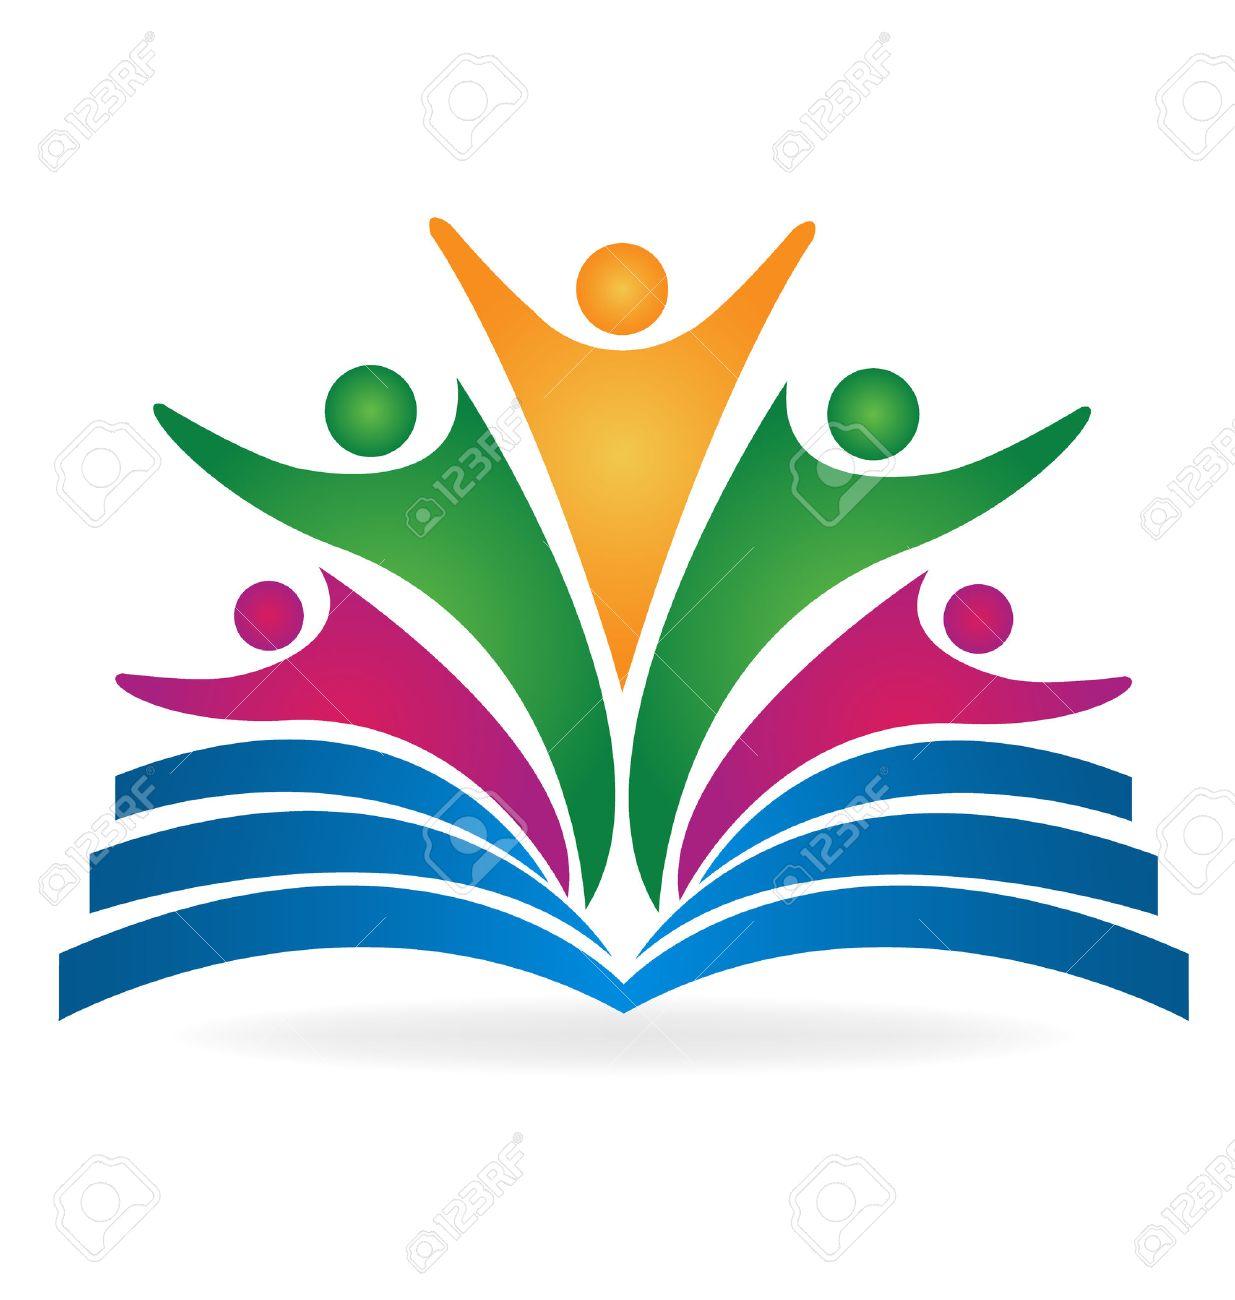 Book teamwork education logo vector image - 53035443